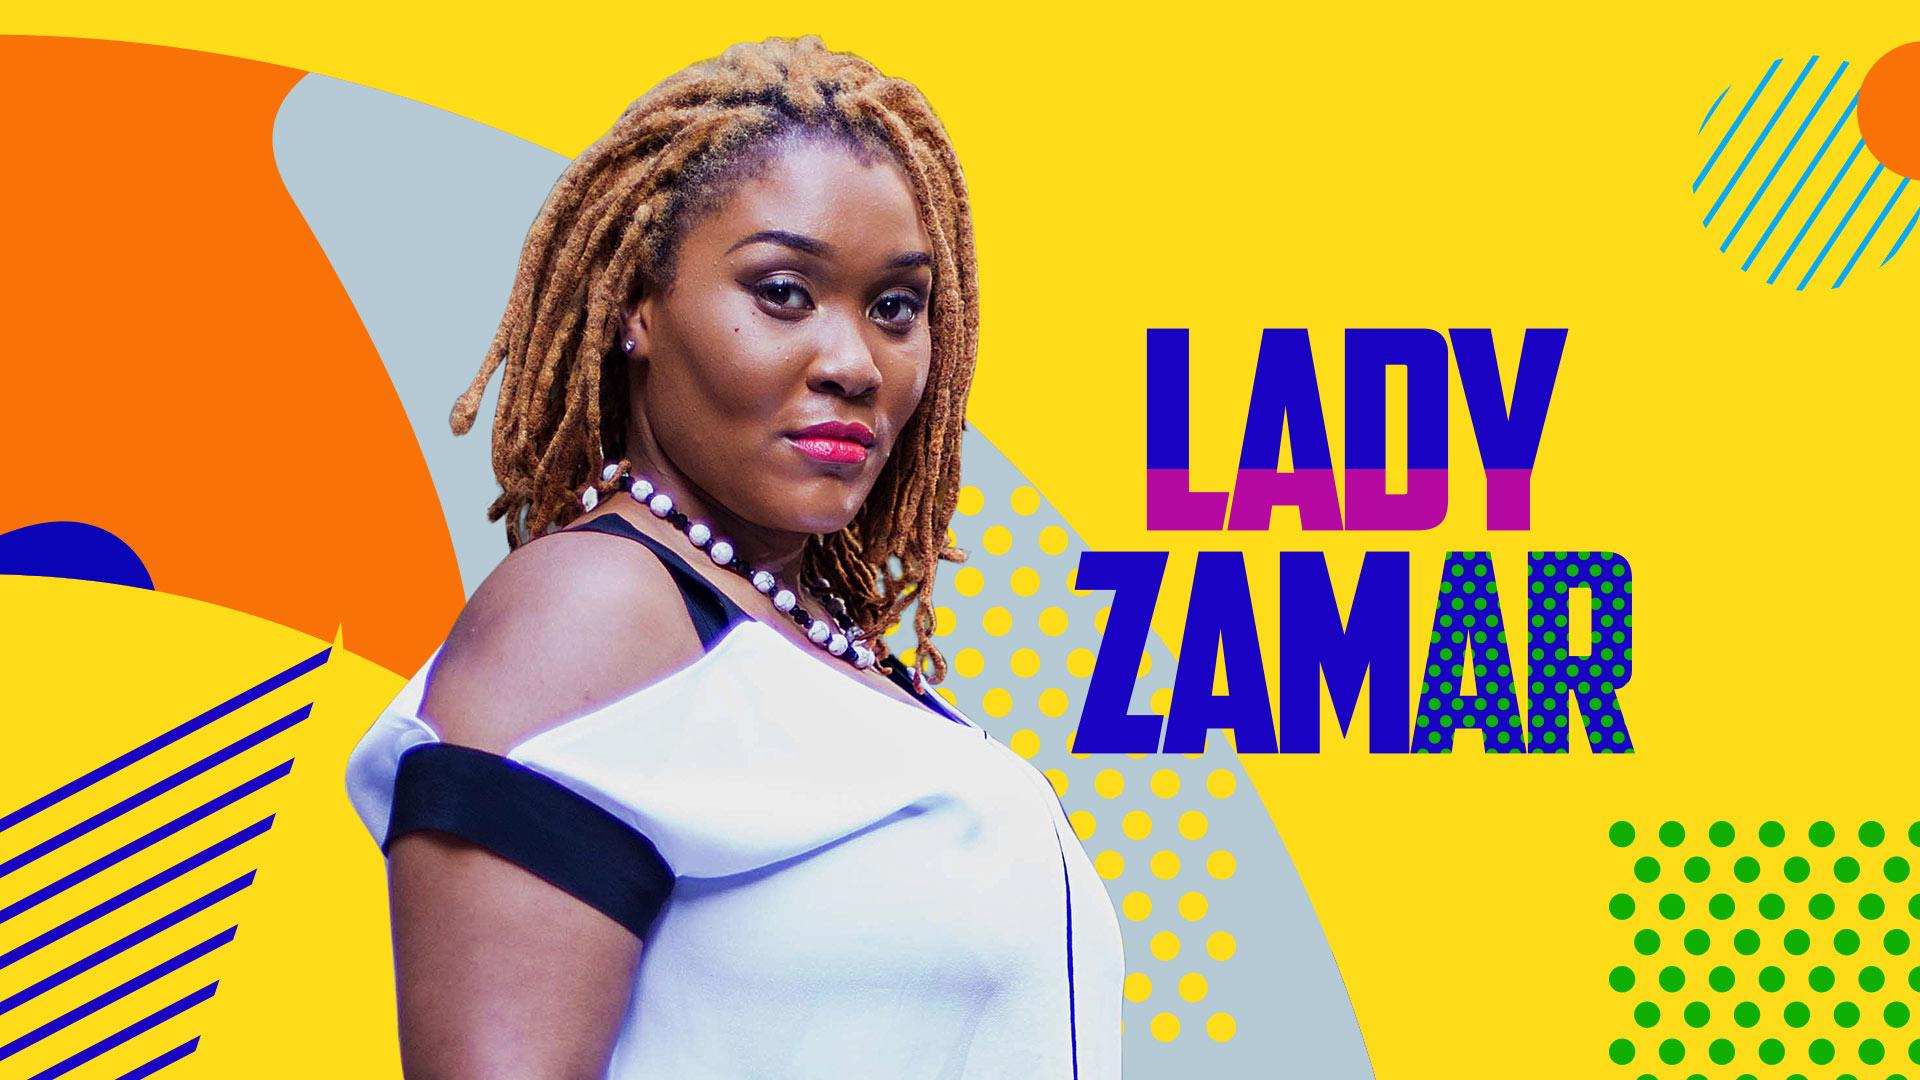 Lady-Zamar